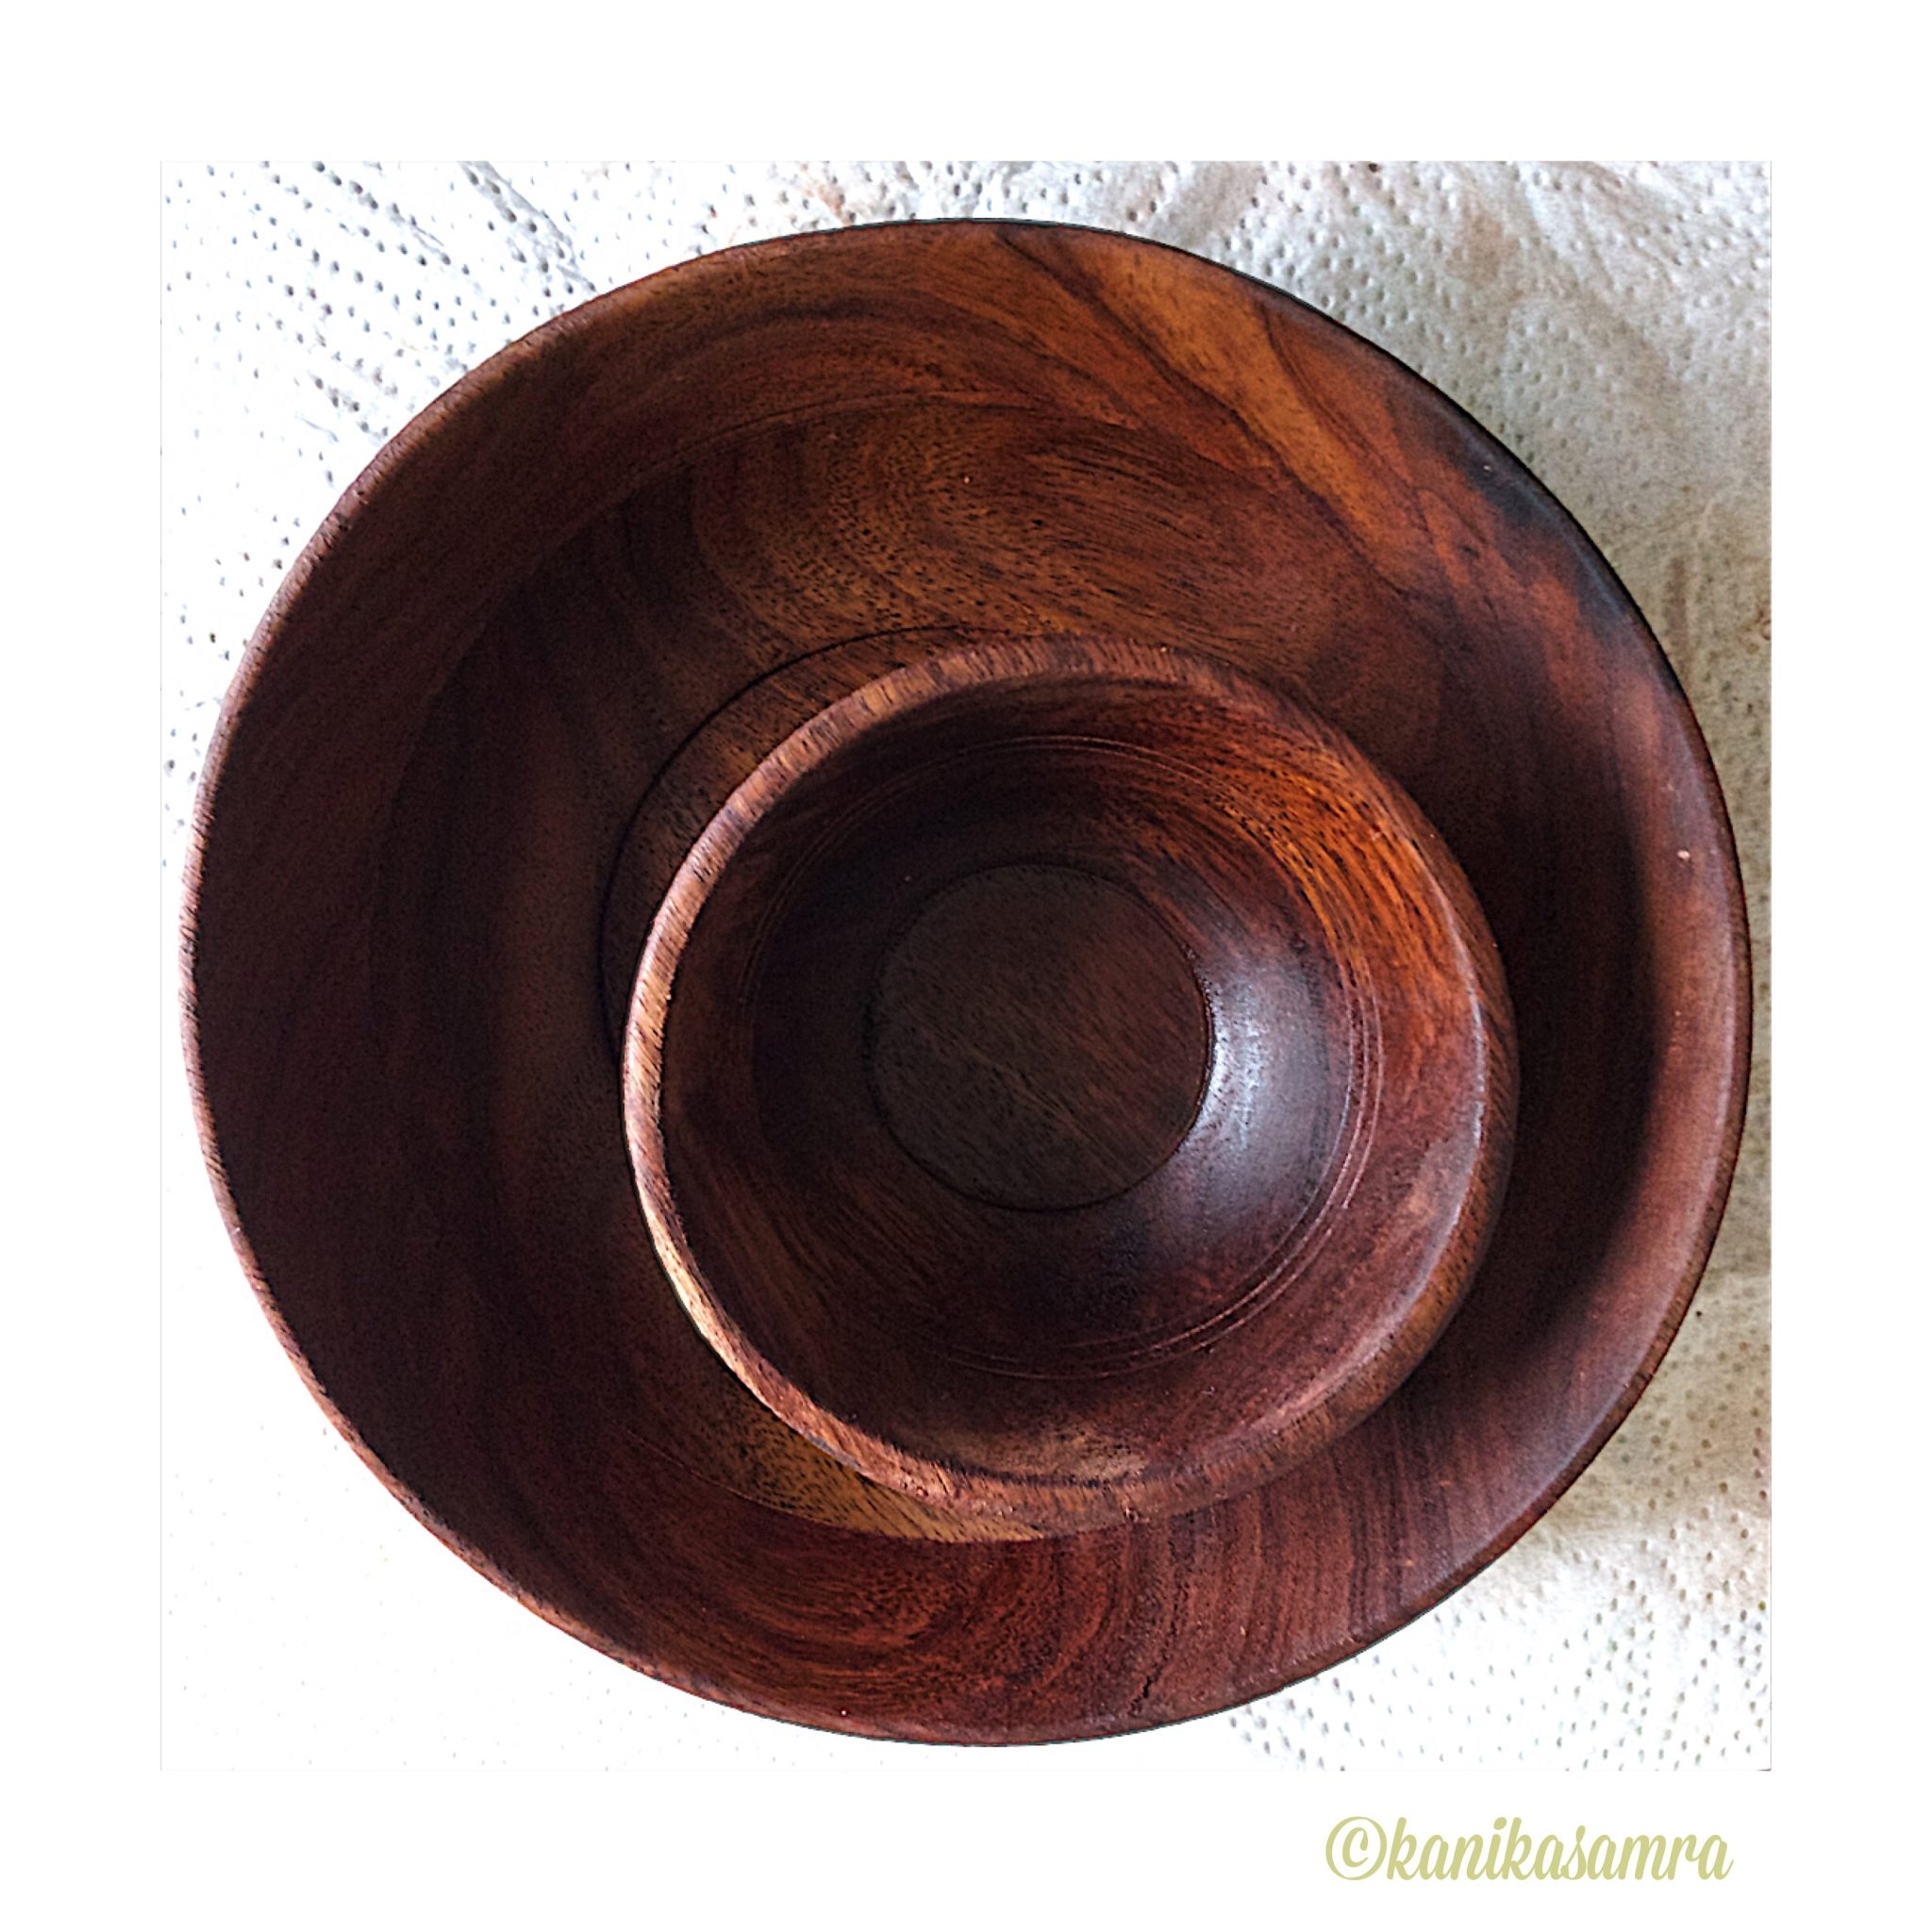 Favorite Bowls